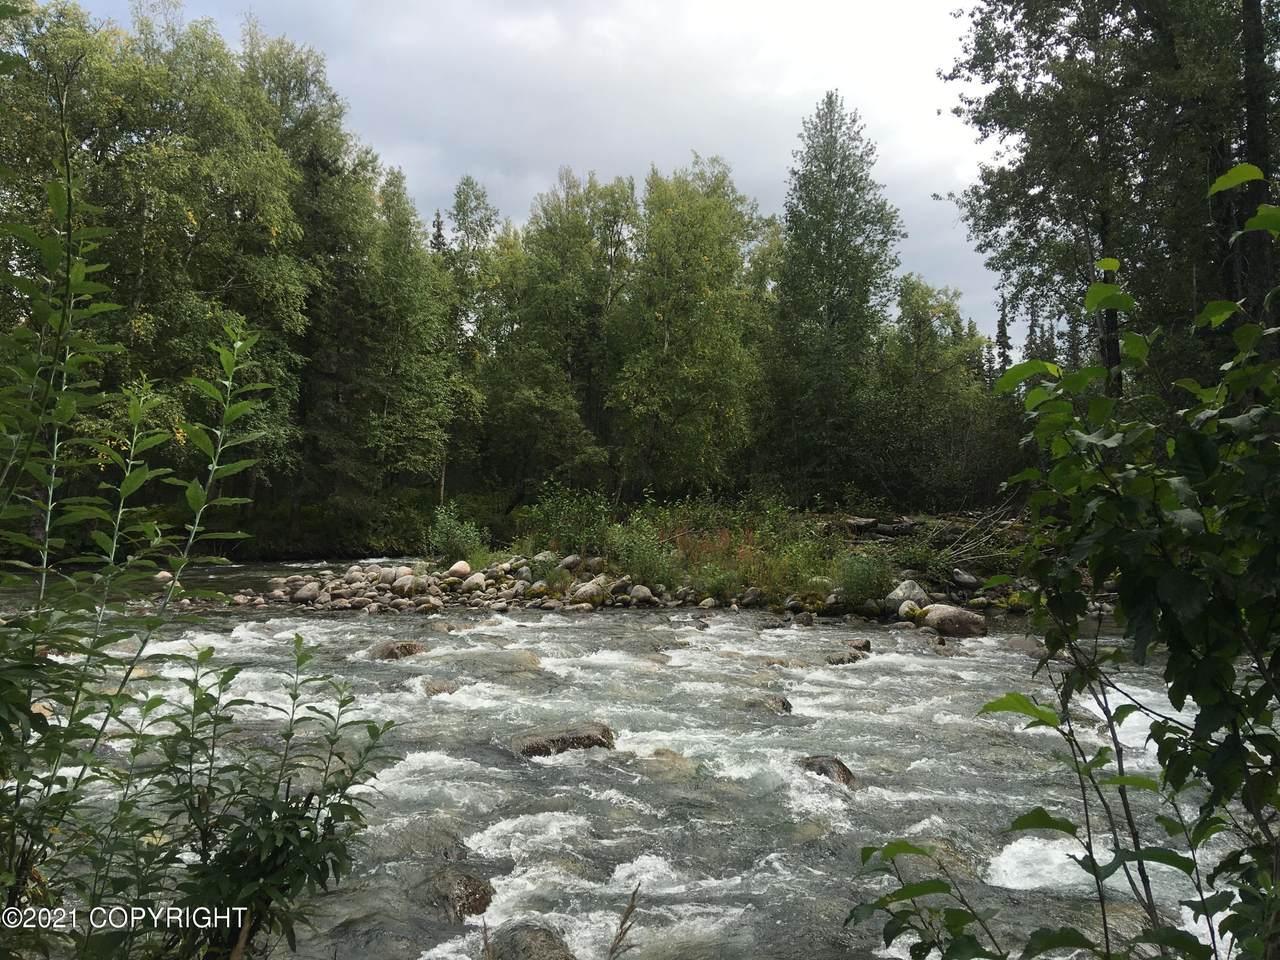 https://bt-photos.global.ssl.fastly.net/alaska/1280_boomver_1_21-1027-2.jpg